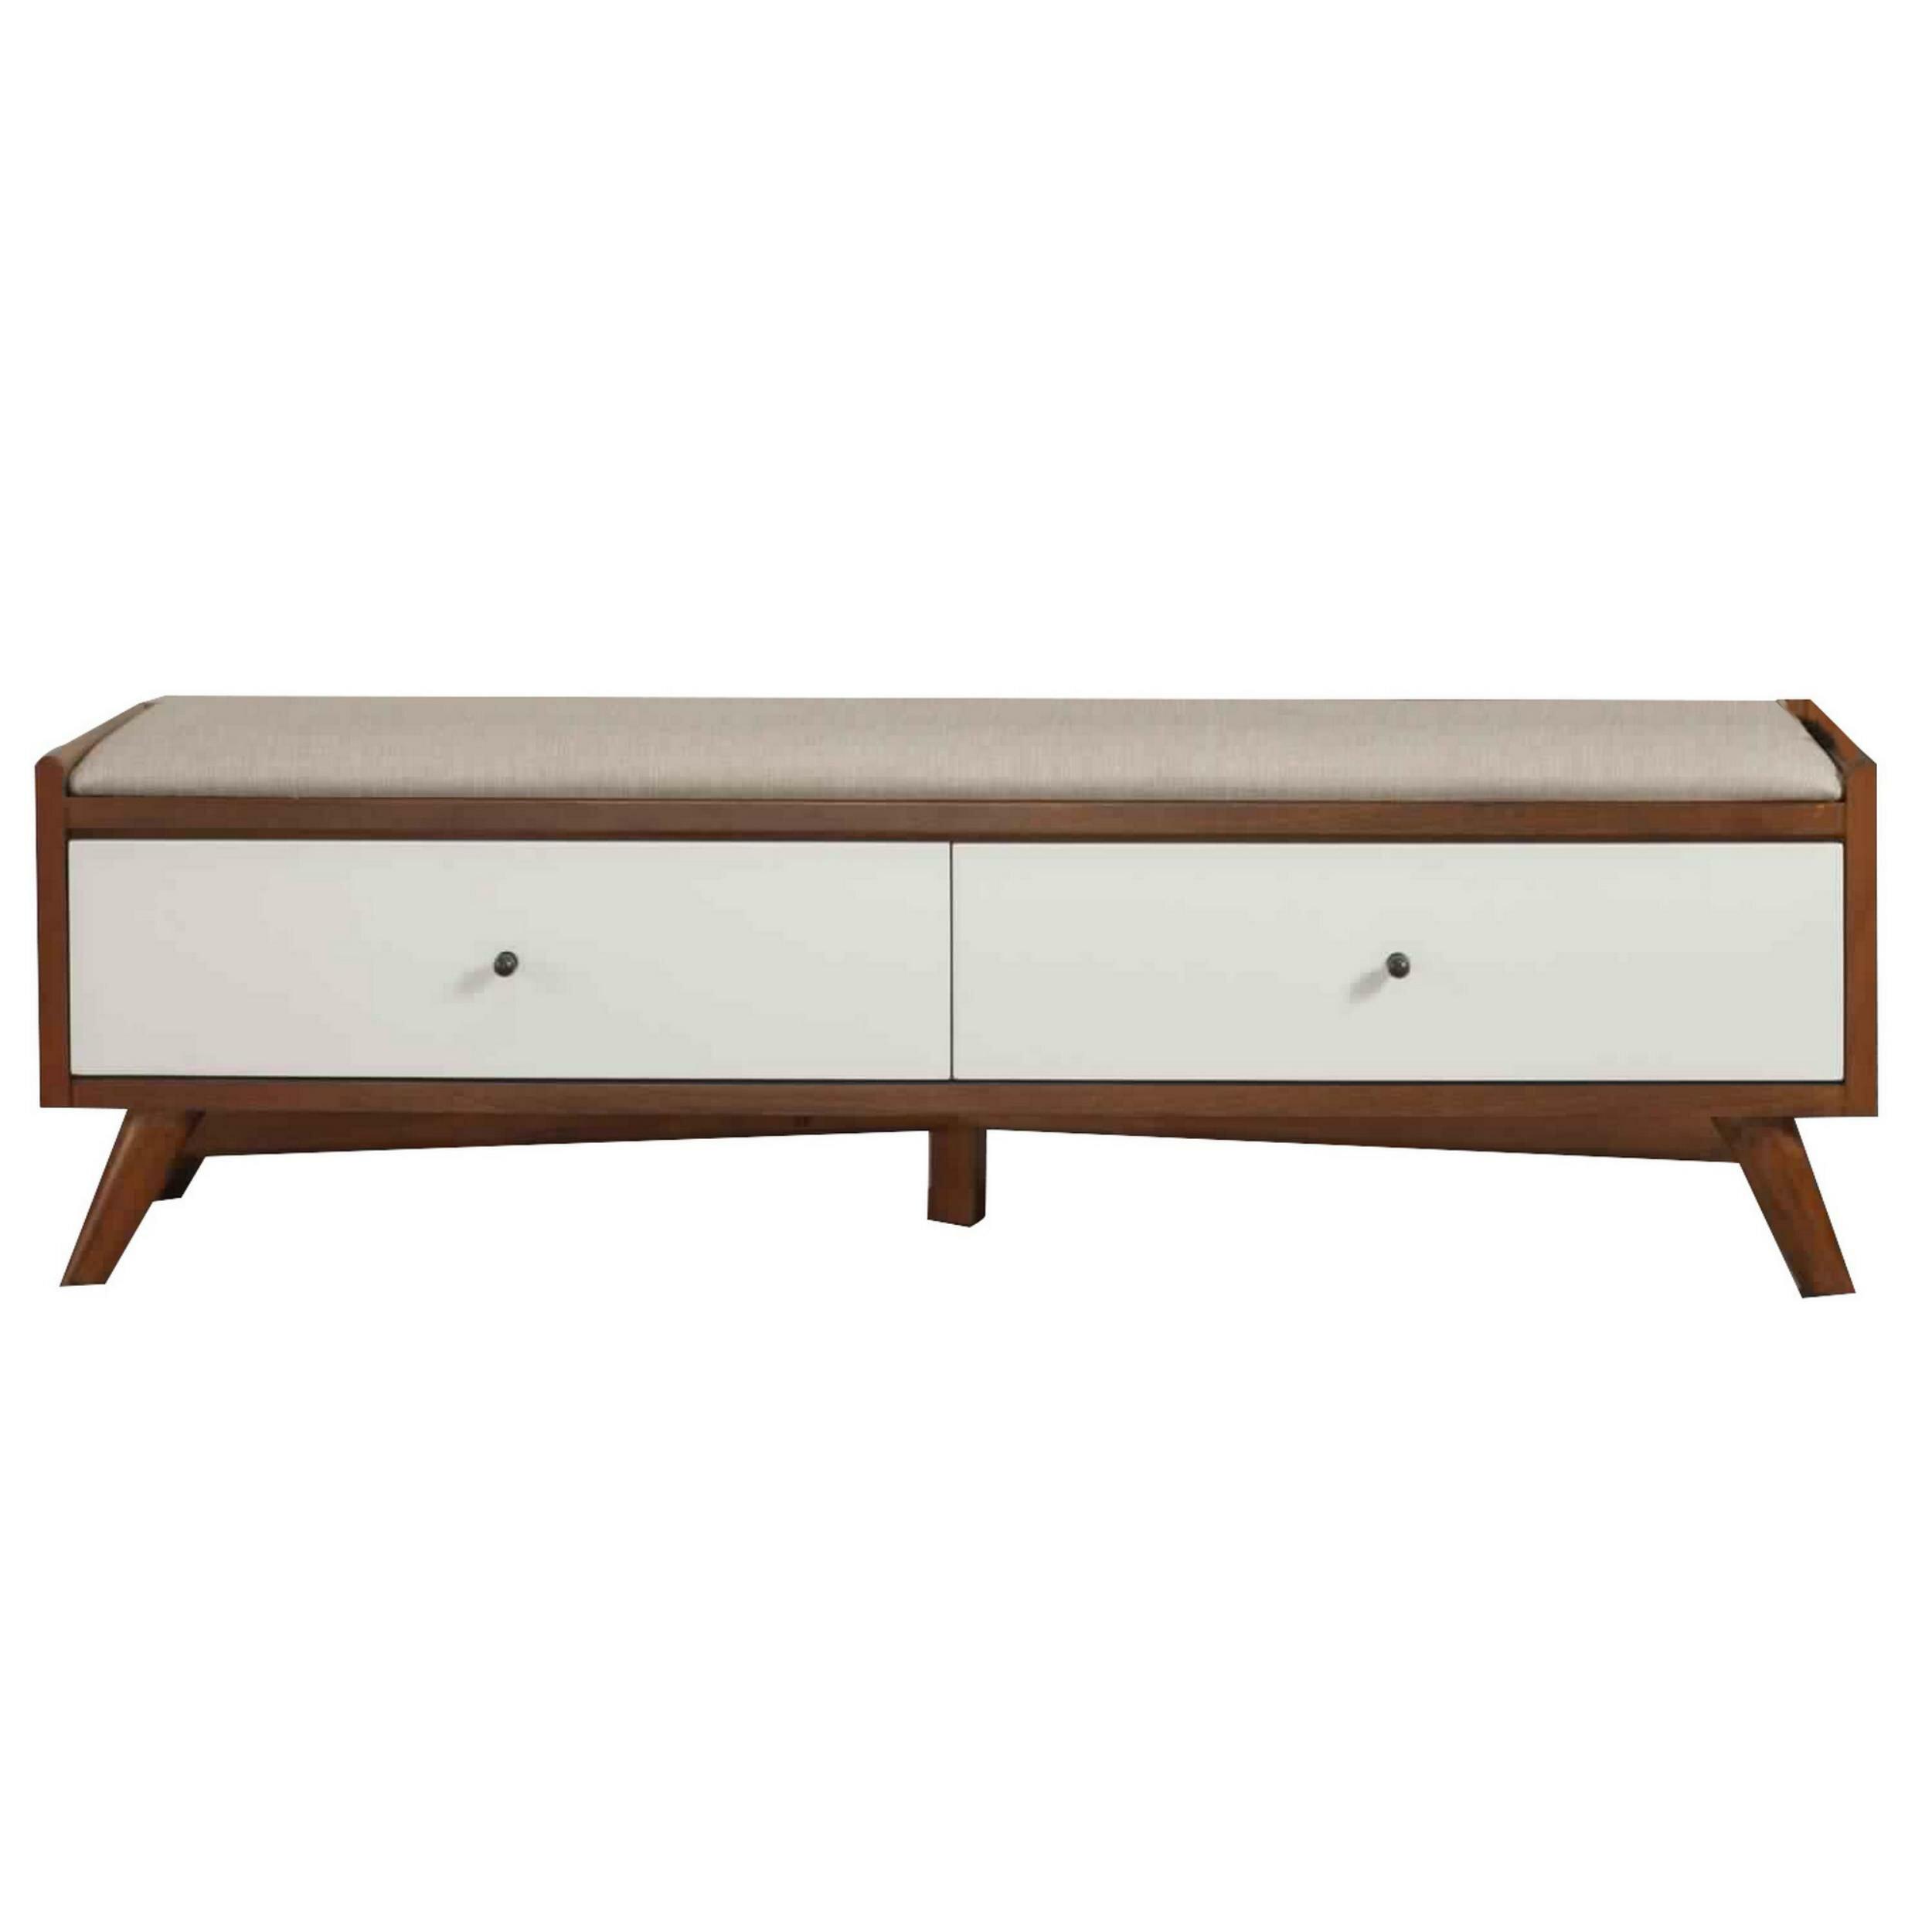 Adel Upholstered Drawer Storage Bench